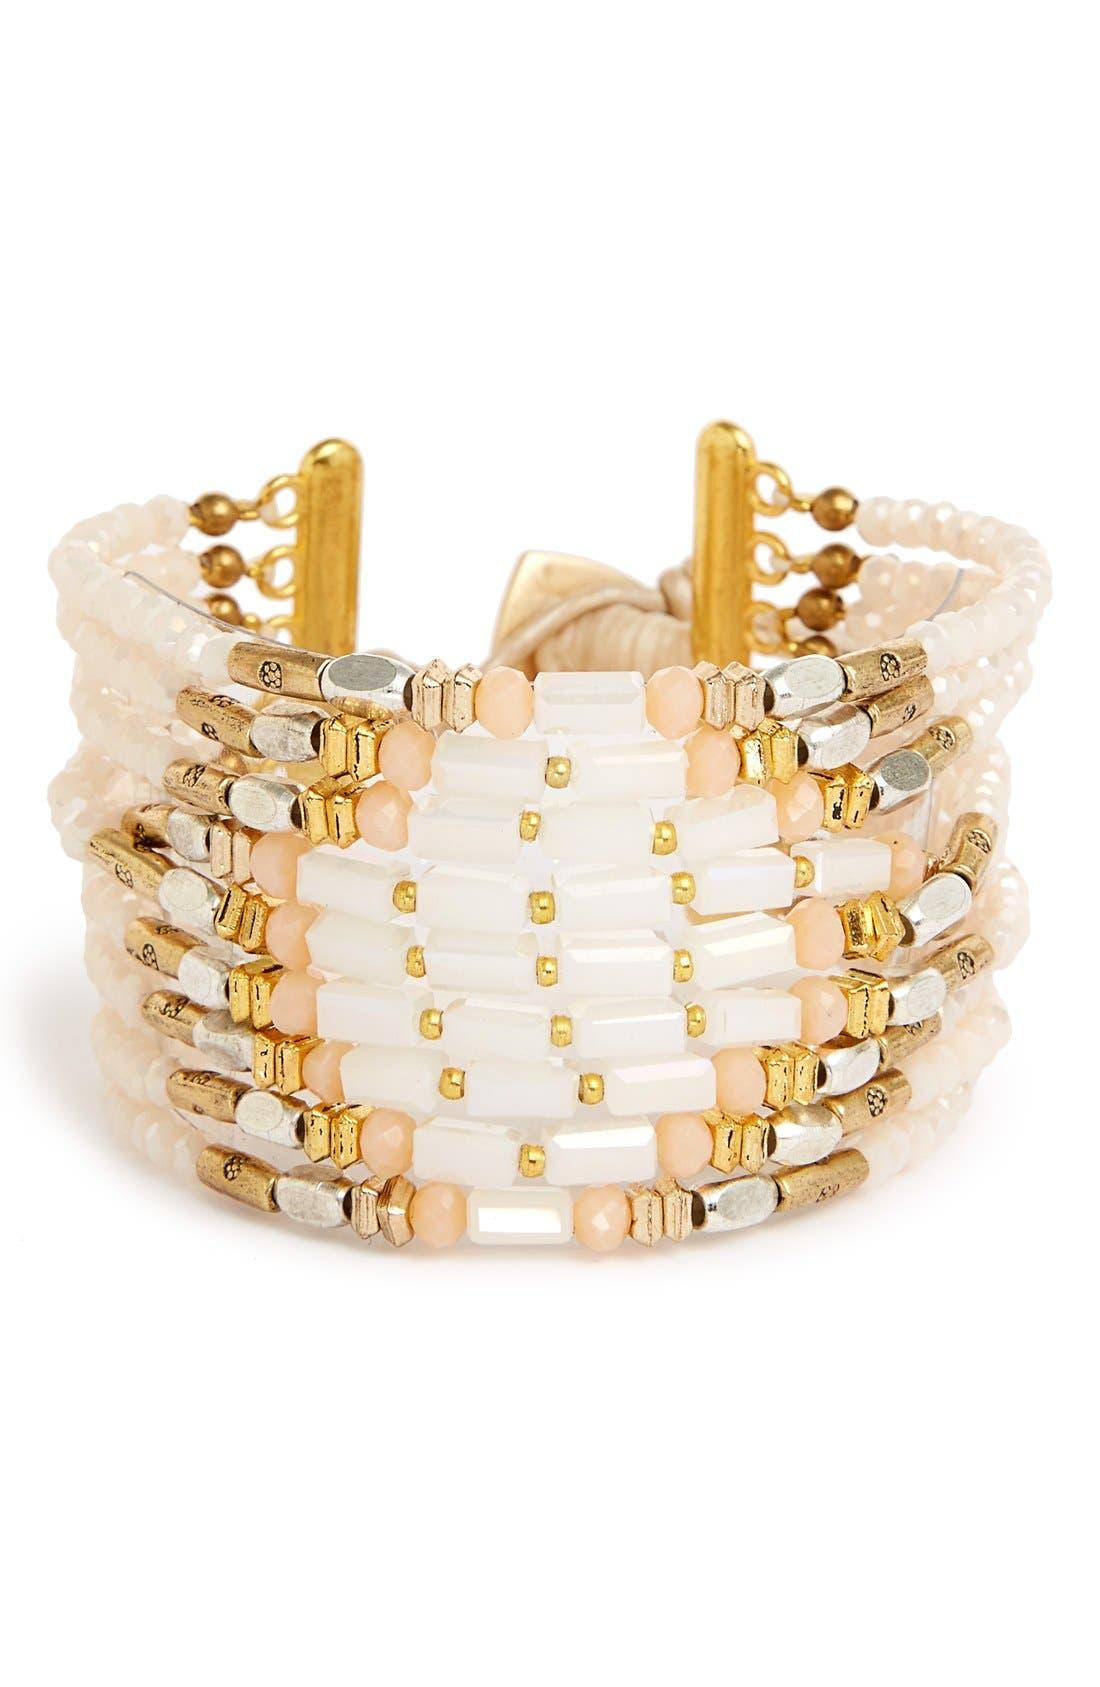 Alternate Image 1 Selected - Nakamol Design Beaded Bracelet Cuff